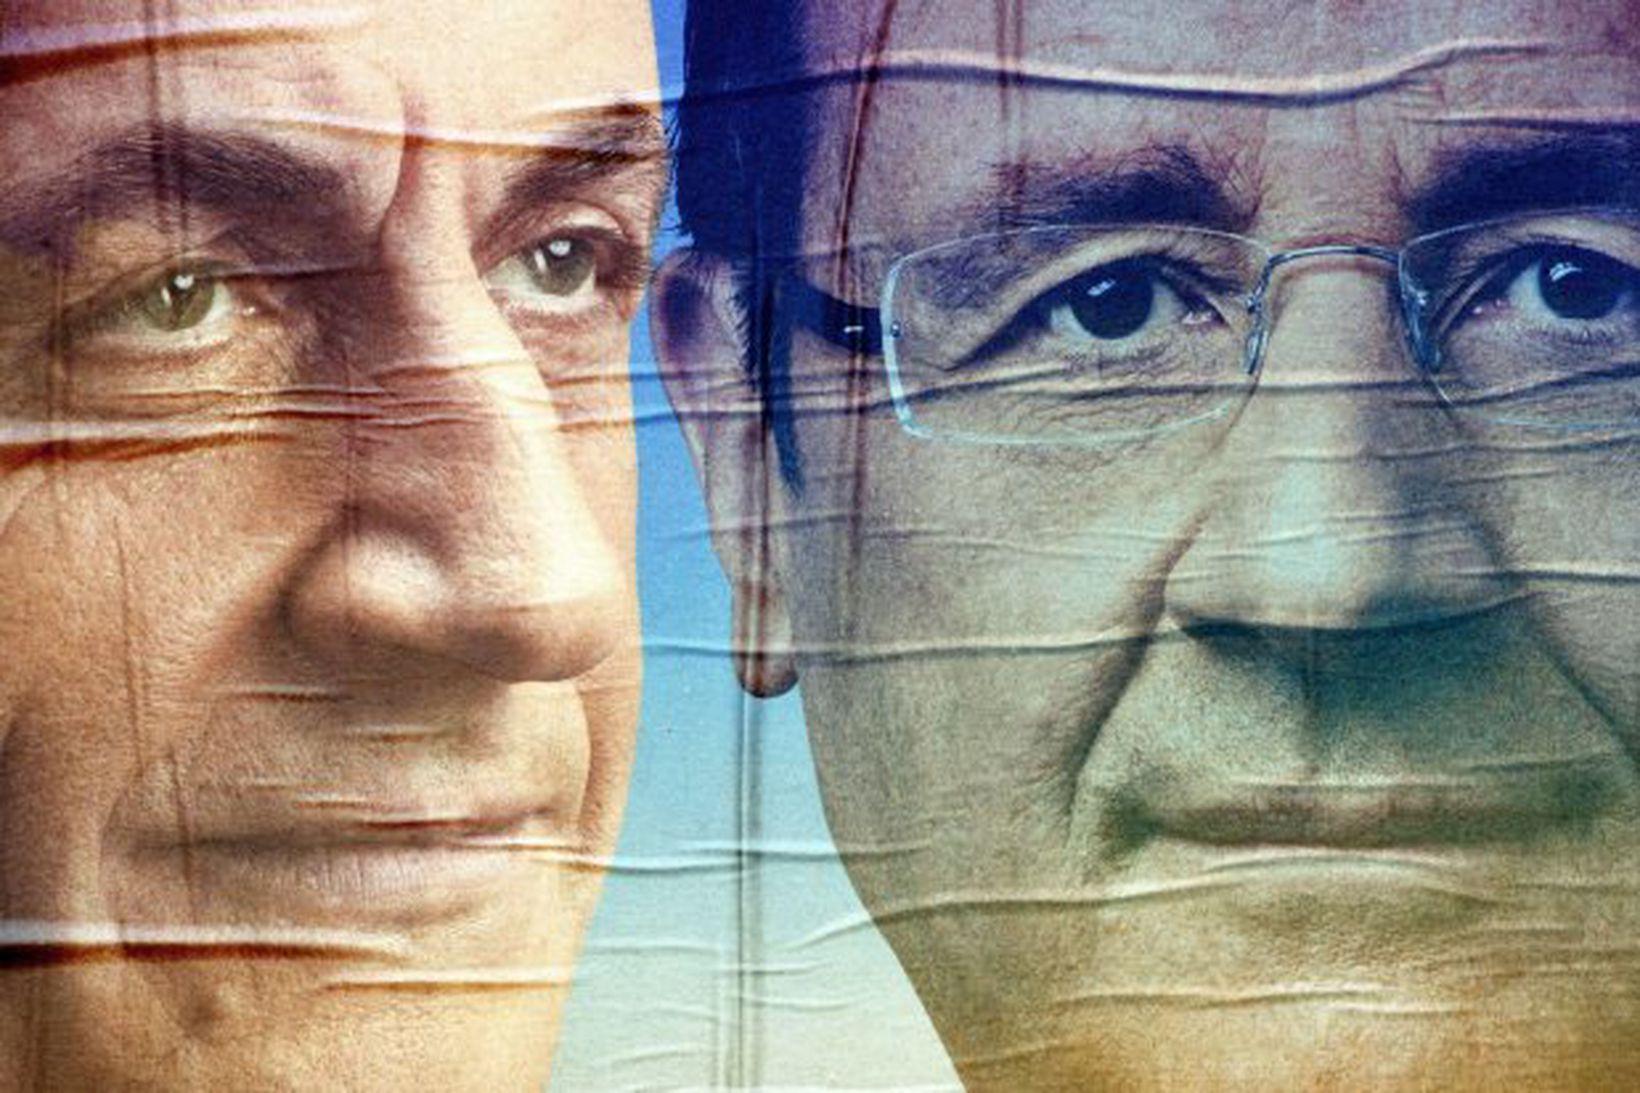 Veggspjald með andlitum Nicolas Sarkozy, forseta Frakklands, og Francois Hollande, …